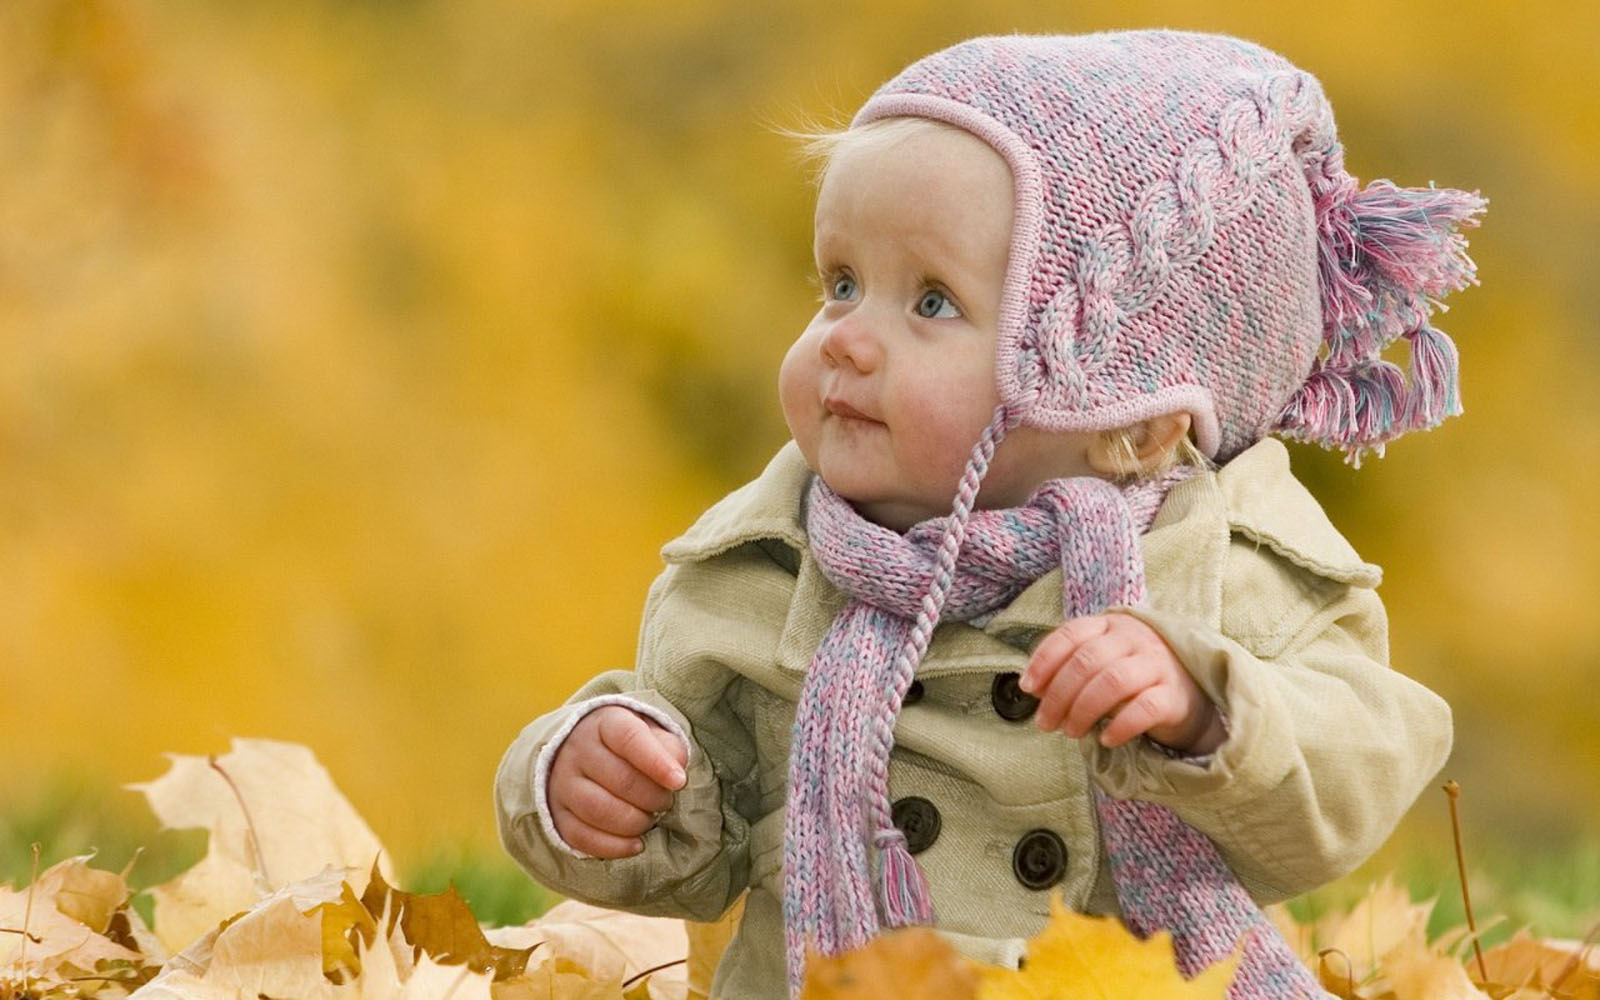 wallpaper: Cute Babies Hd Wallpapers